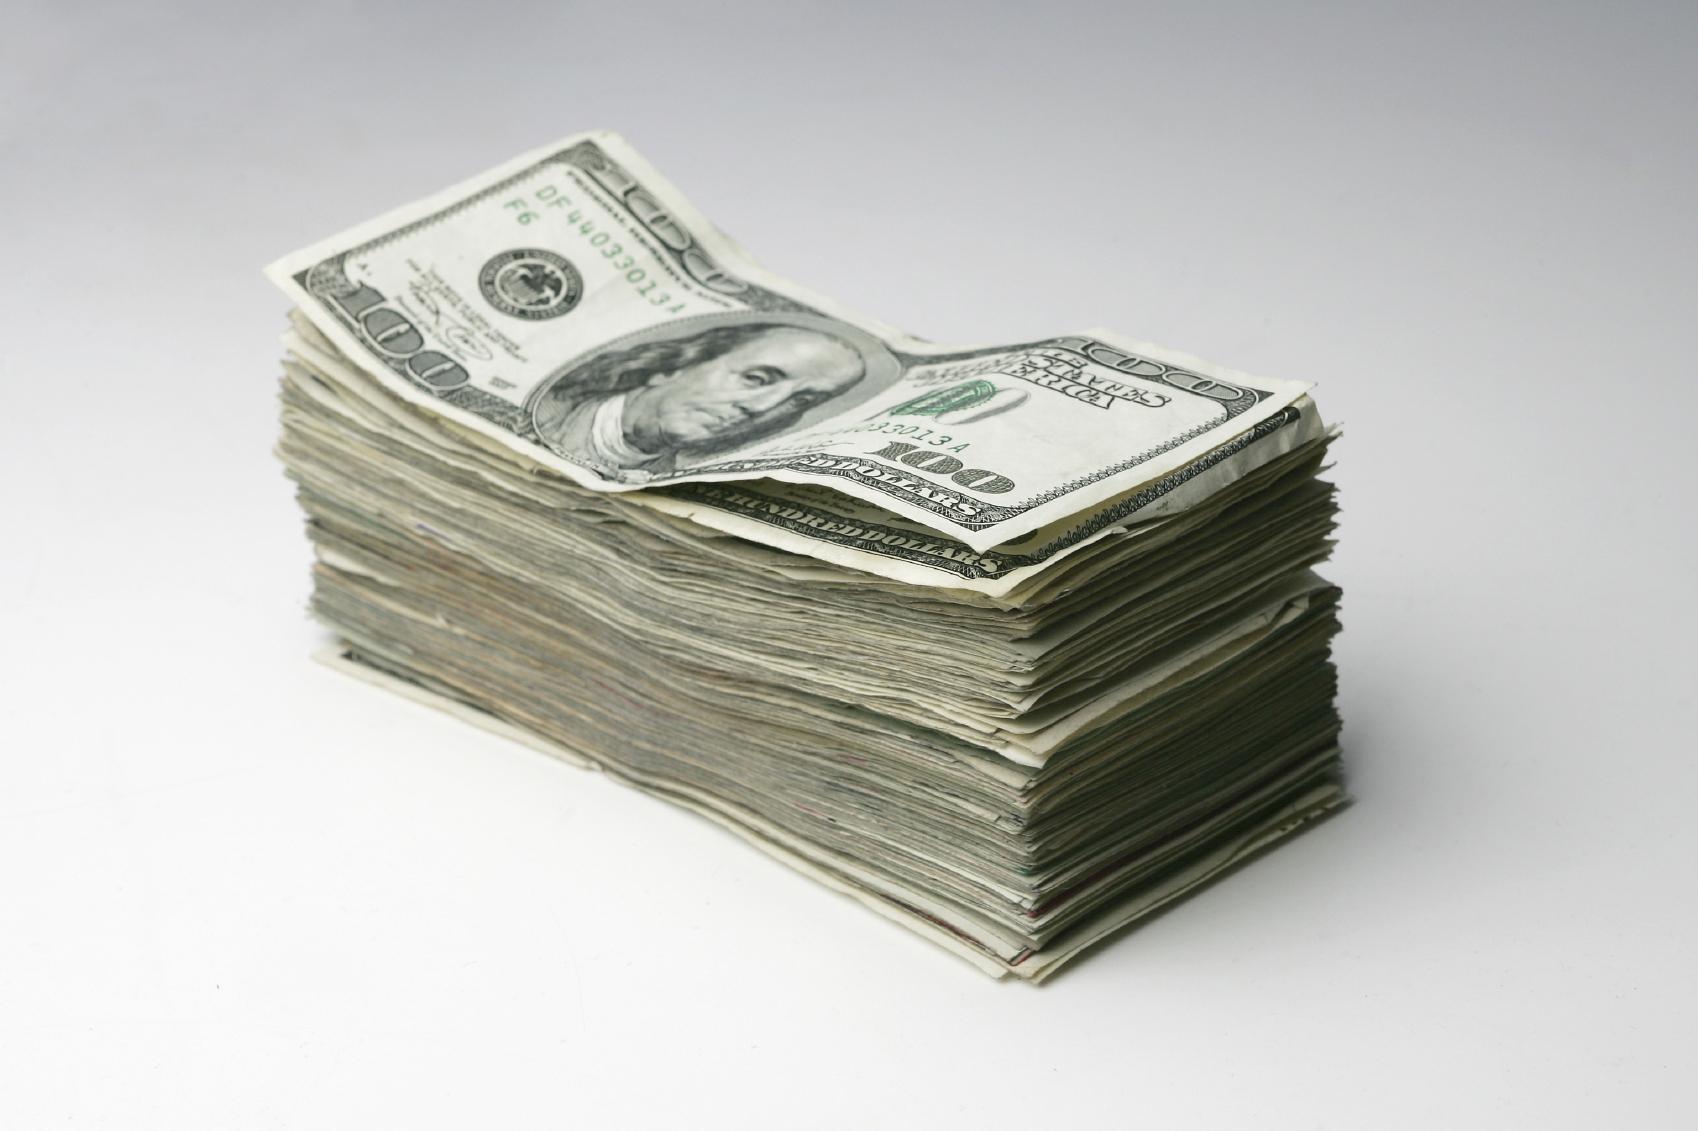 Publix Christmas Bonus Date 2020 These Employees Got a $100,000 Christmas Bonus | Money